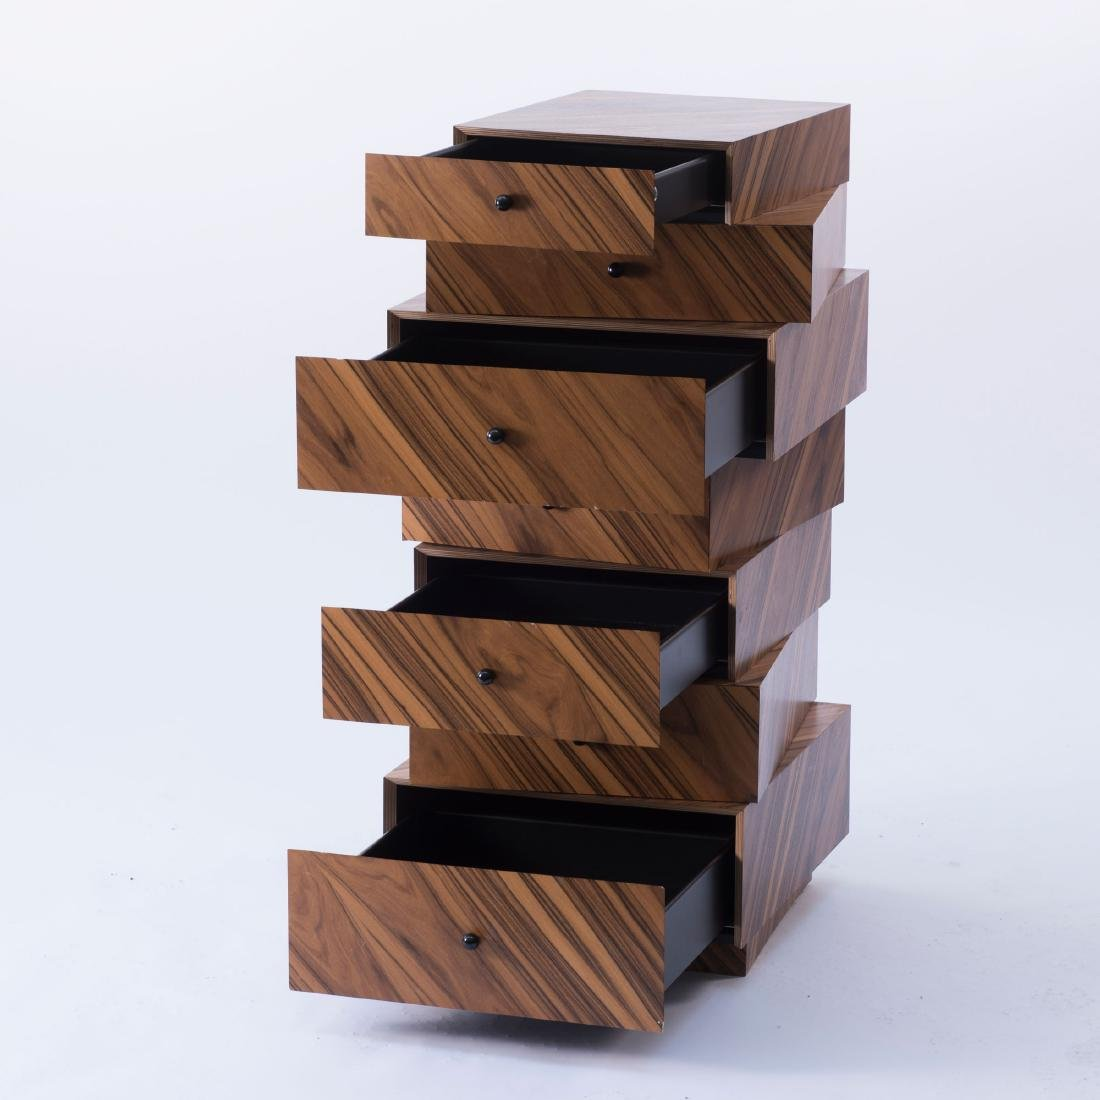 'Schubladenstapel' dresser, 1982 - 4